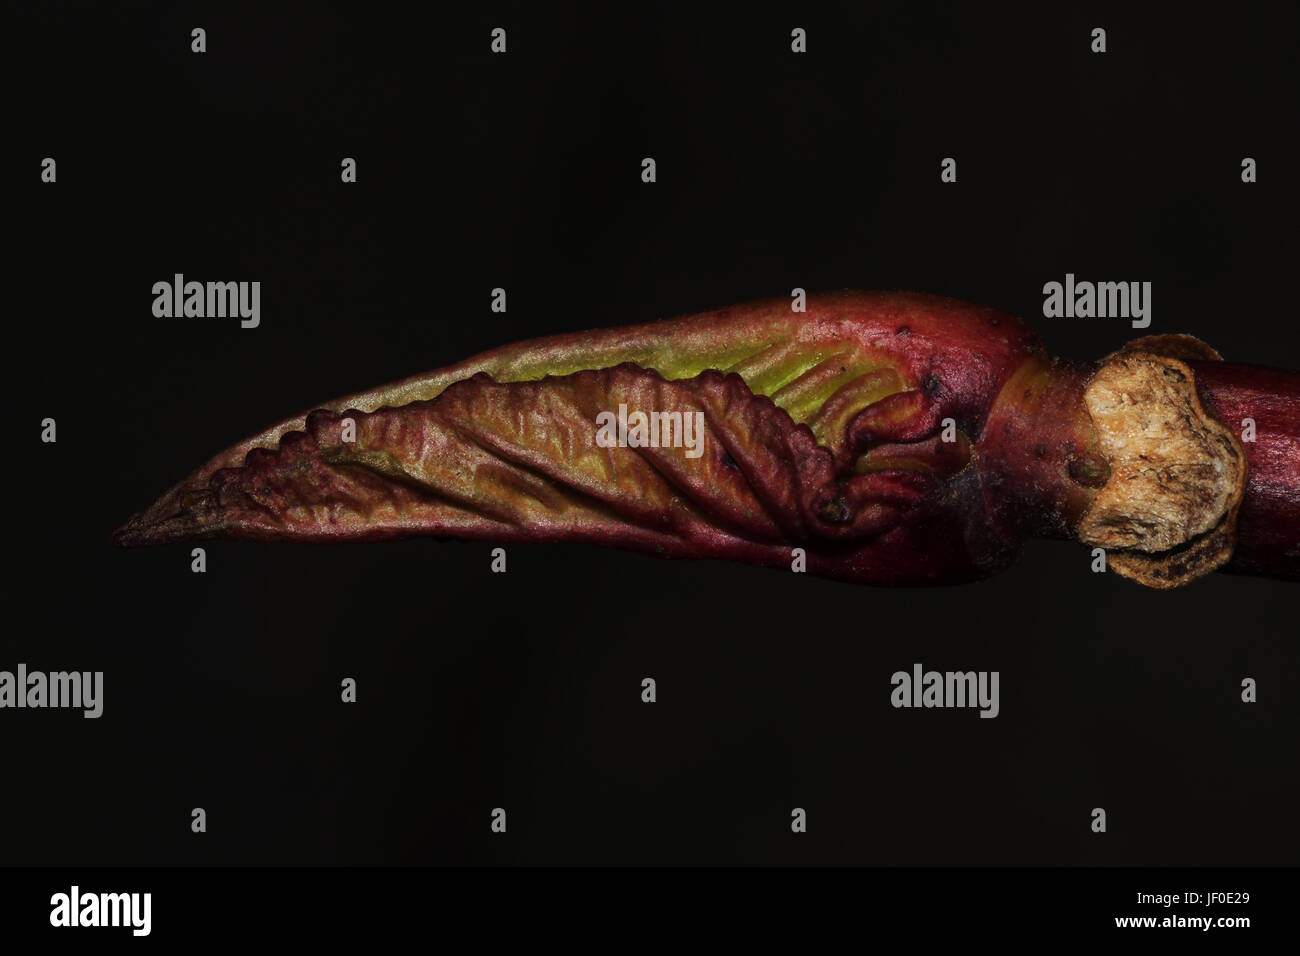 Unfolding leaf - Stock Image